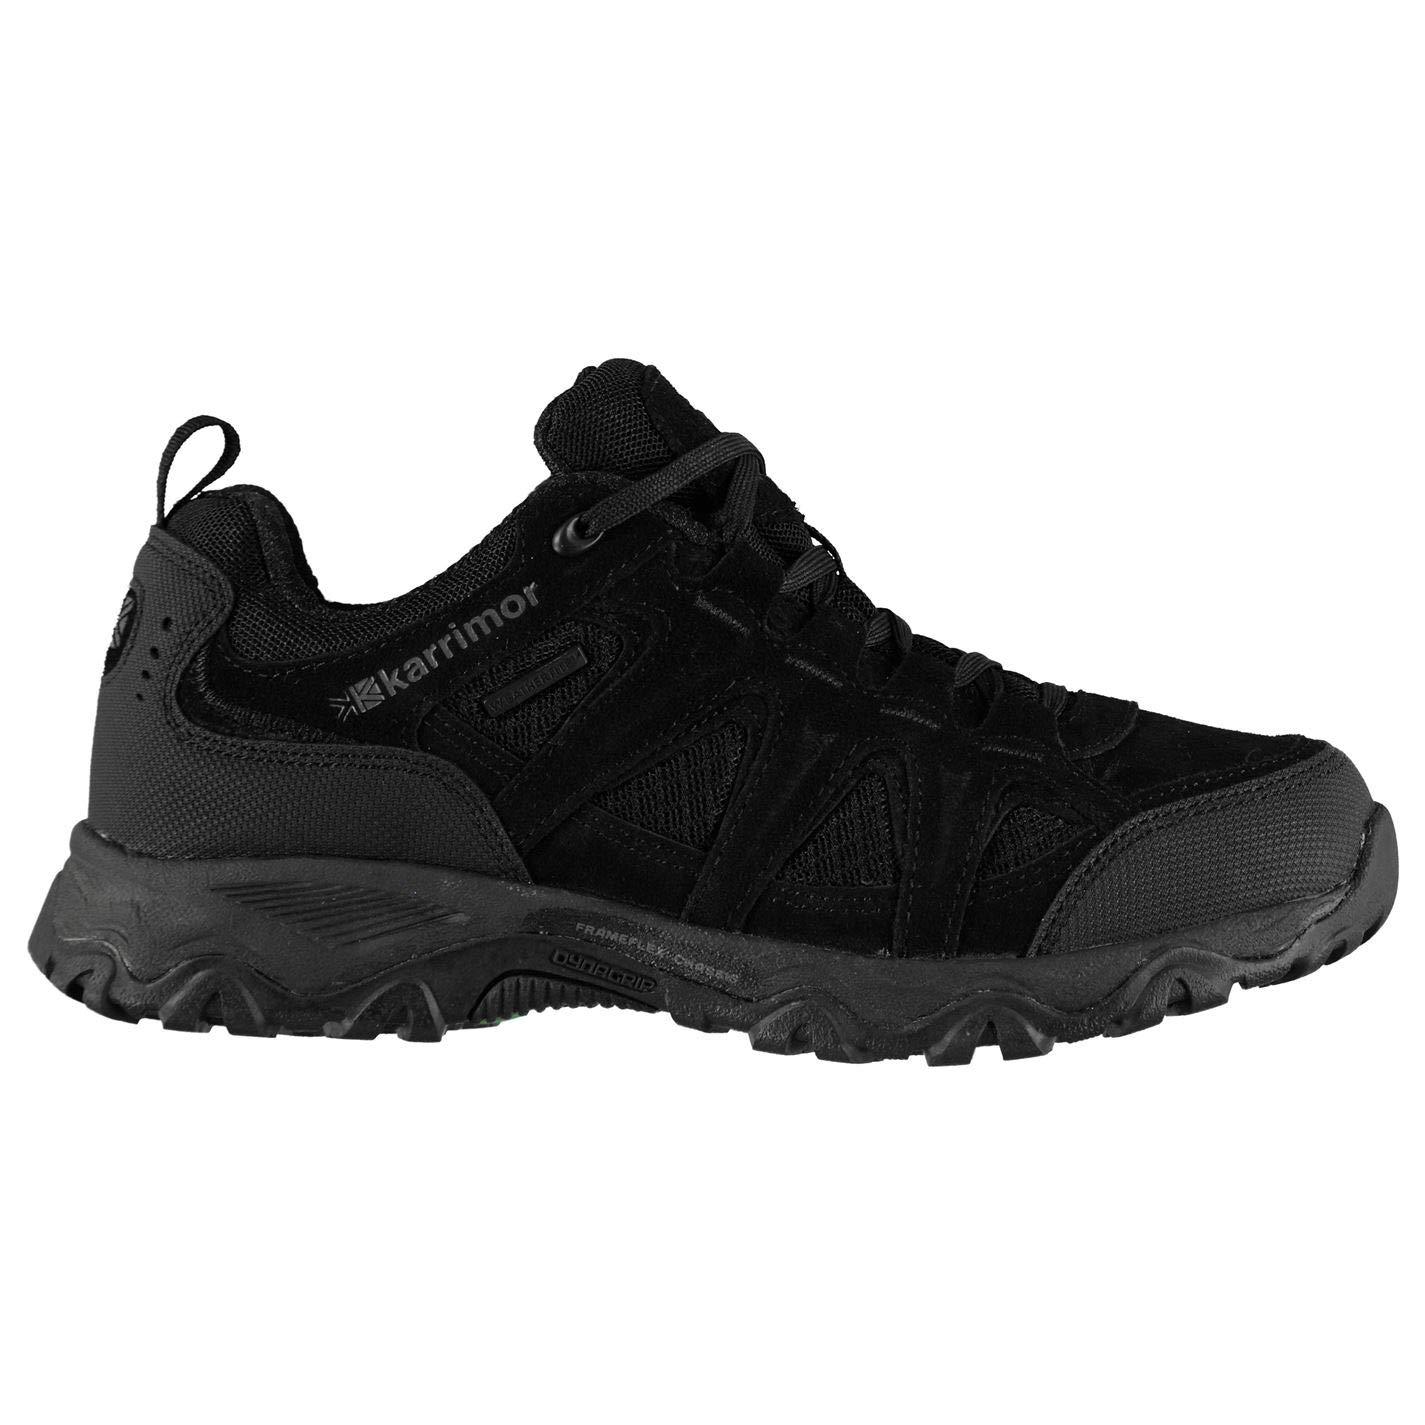 rock-bottom price meticulous dyeing processes hot-selling genuine Karrimor Ladies Mount Low Walking Shoe